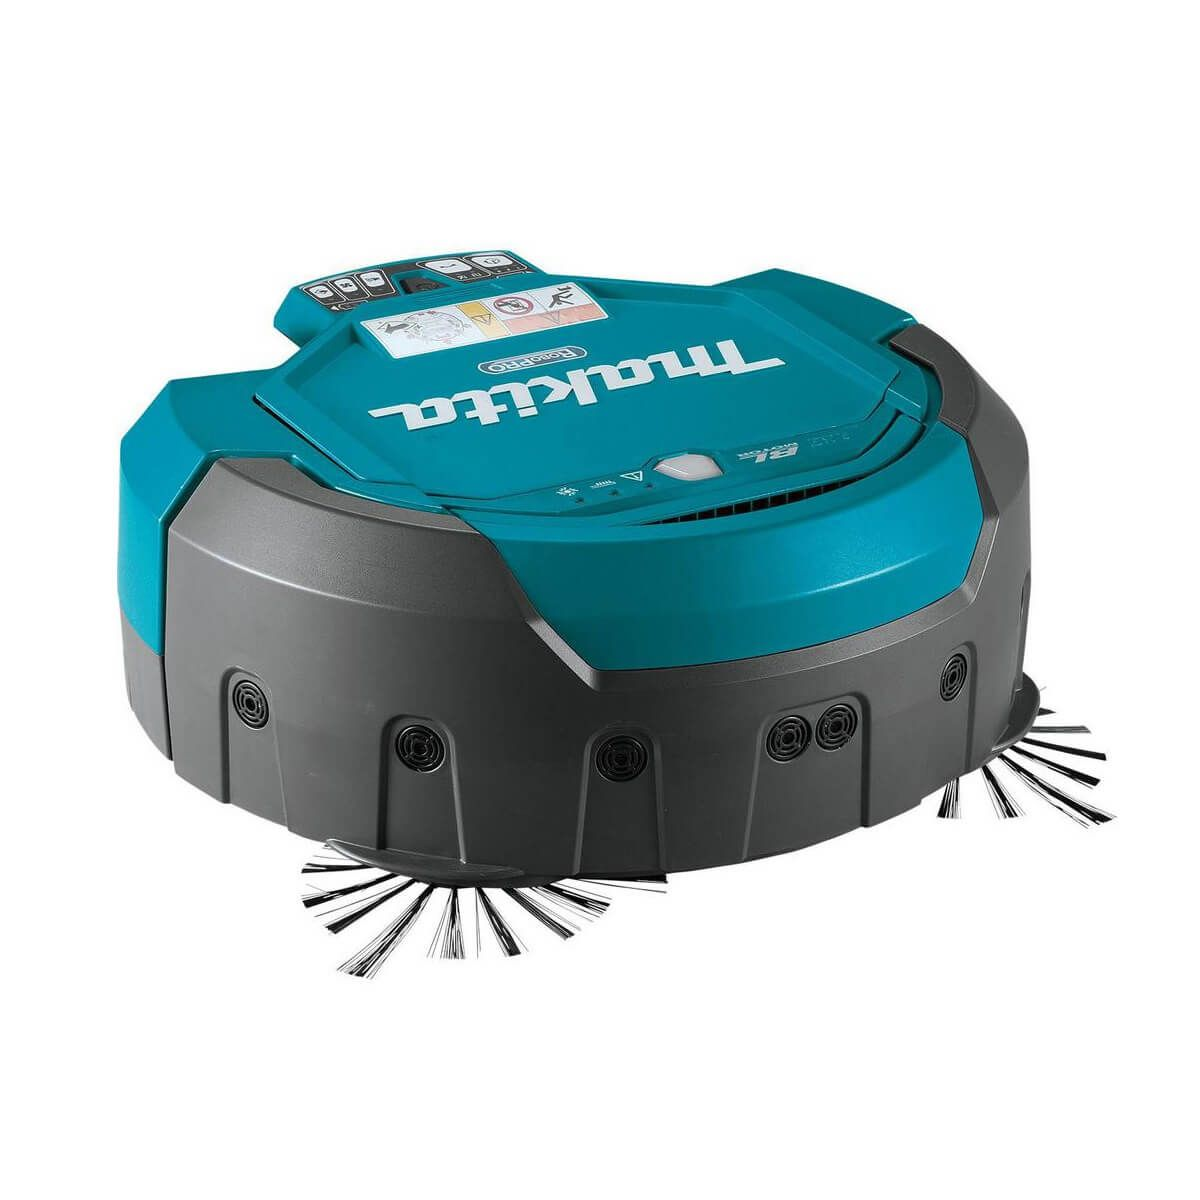 21 Tools So Worth Splurging On The Family Handyman In 2020 Makita Robot Vacuum Cleaner Robot Vacuum